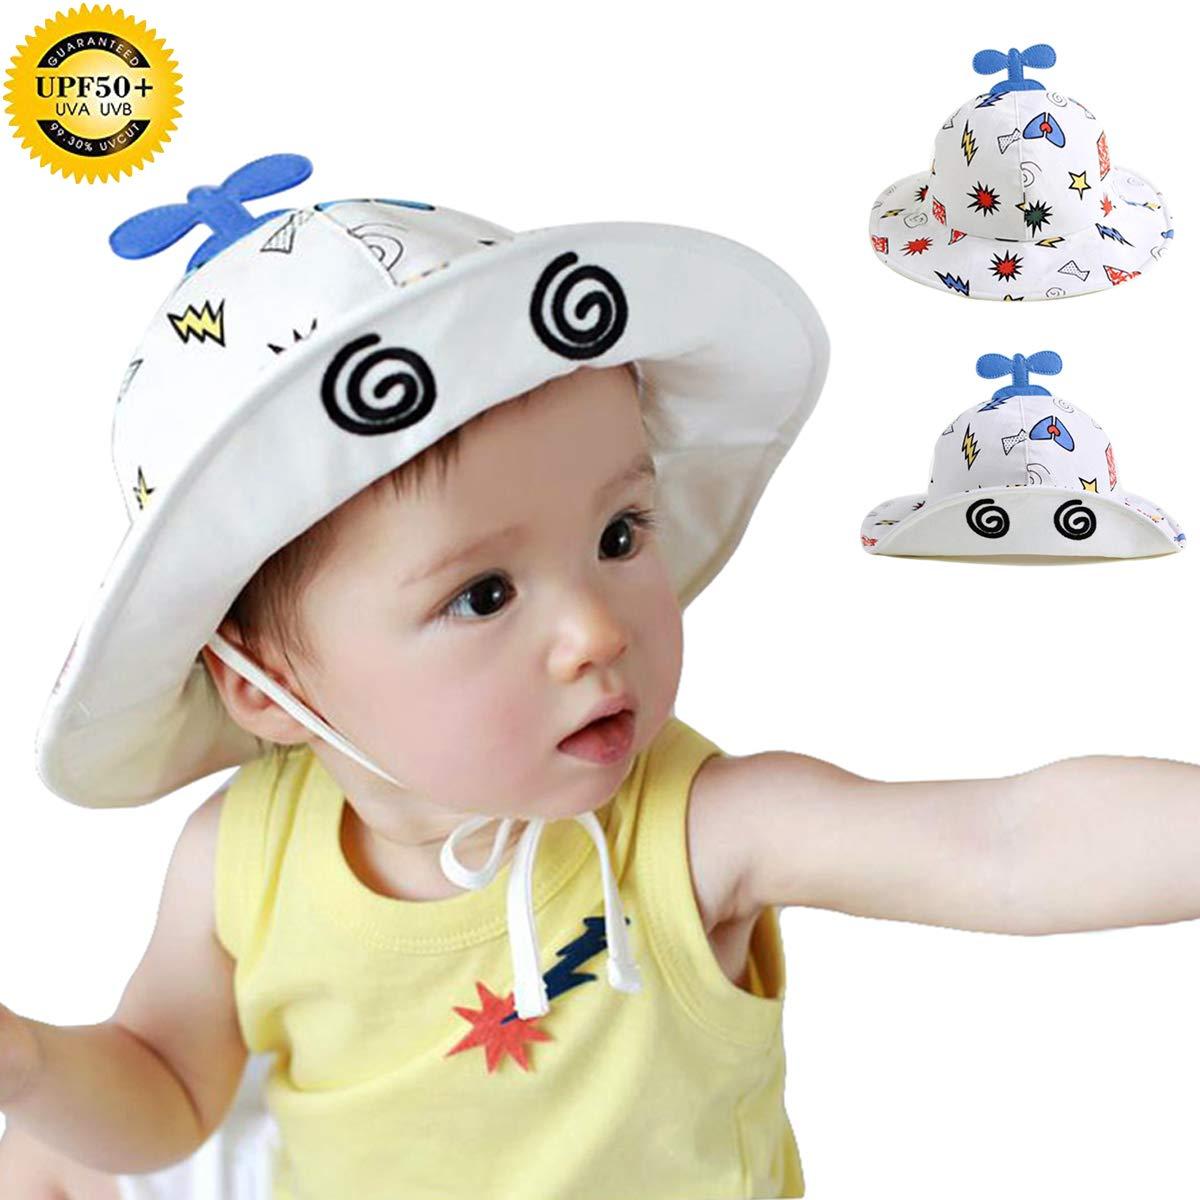 Baby Sun hat Summer Beach hat Toddler Hats for Boys Bucket hat Cotton UV Hat S-TYM002